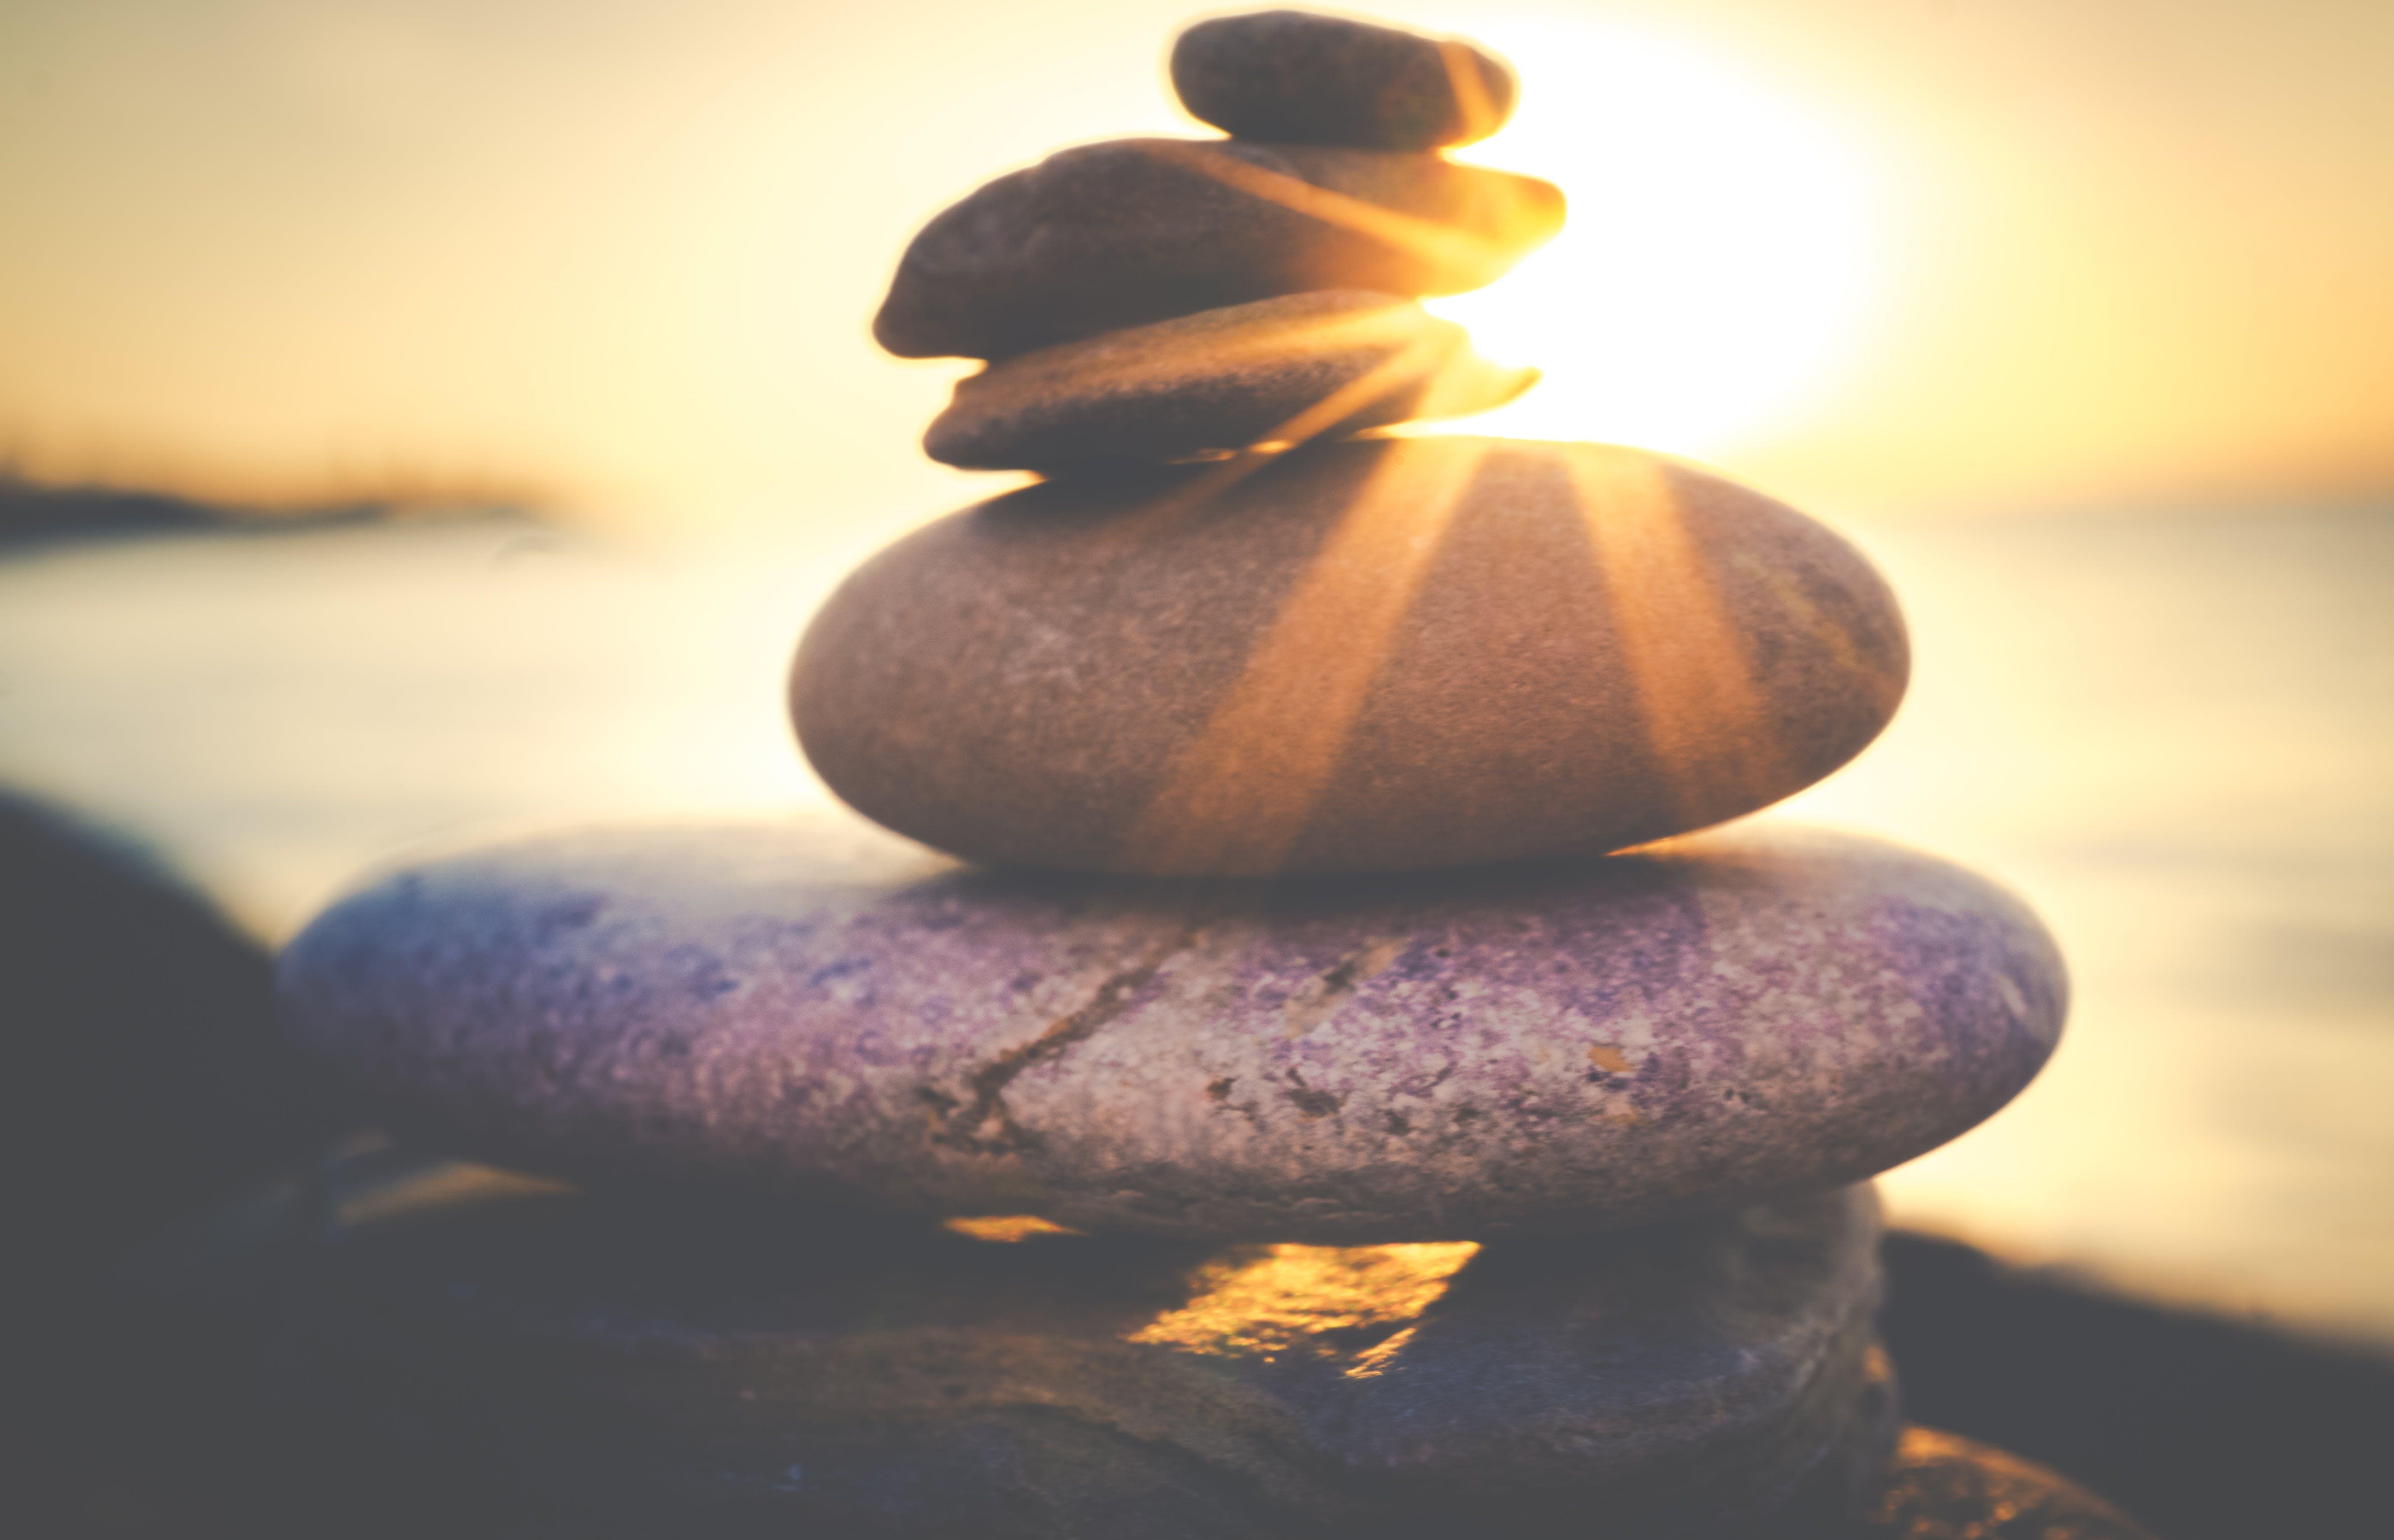 Kostenloses Stock Foto zu meer, natur, sonnenuntergang, strand